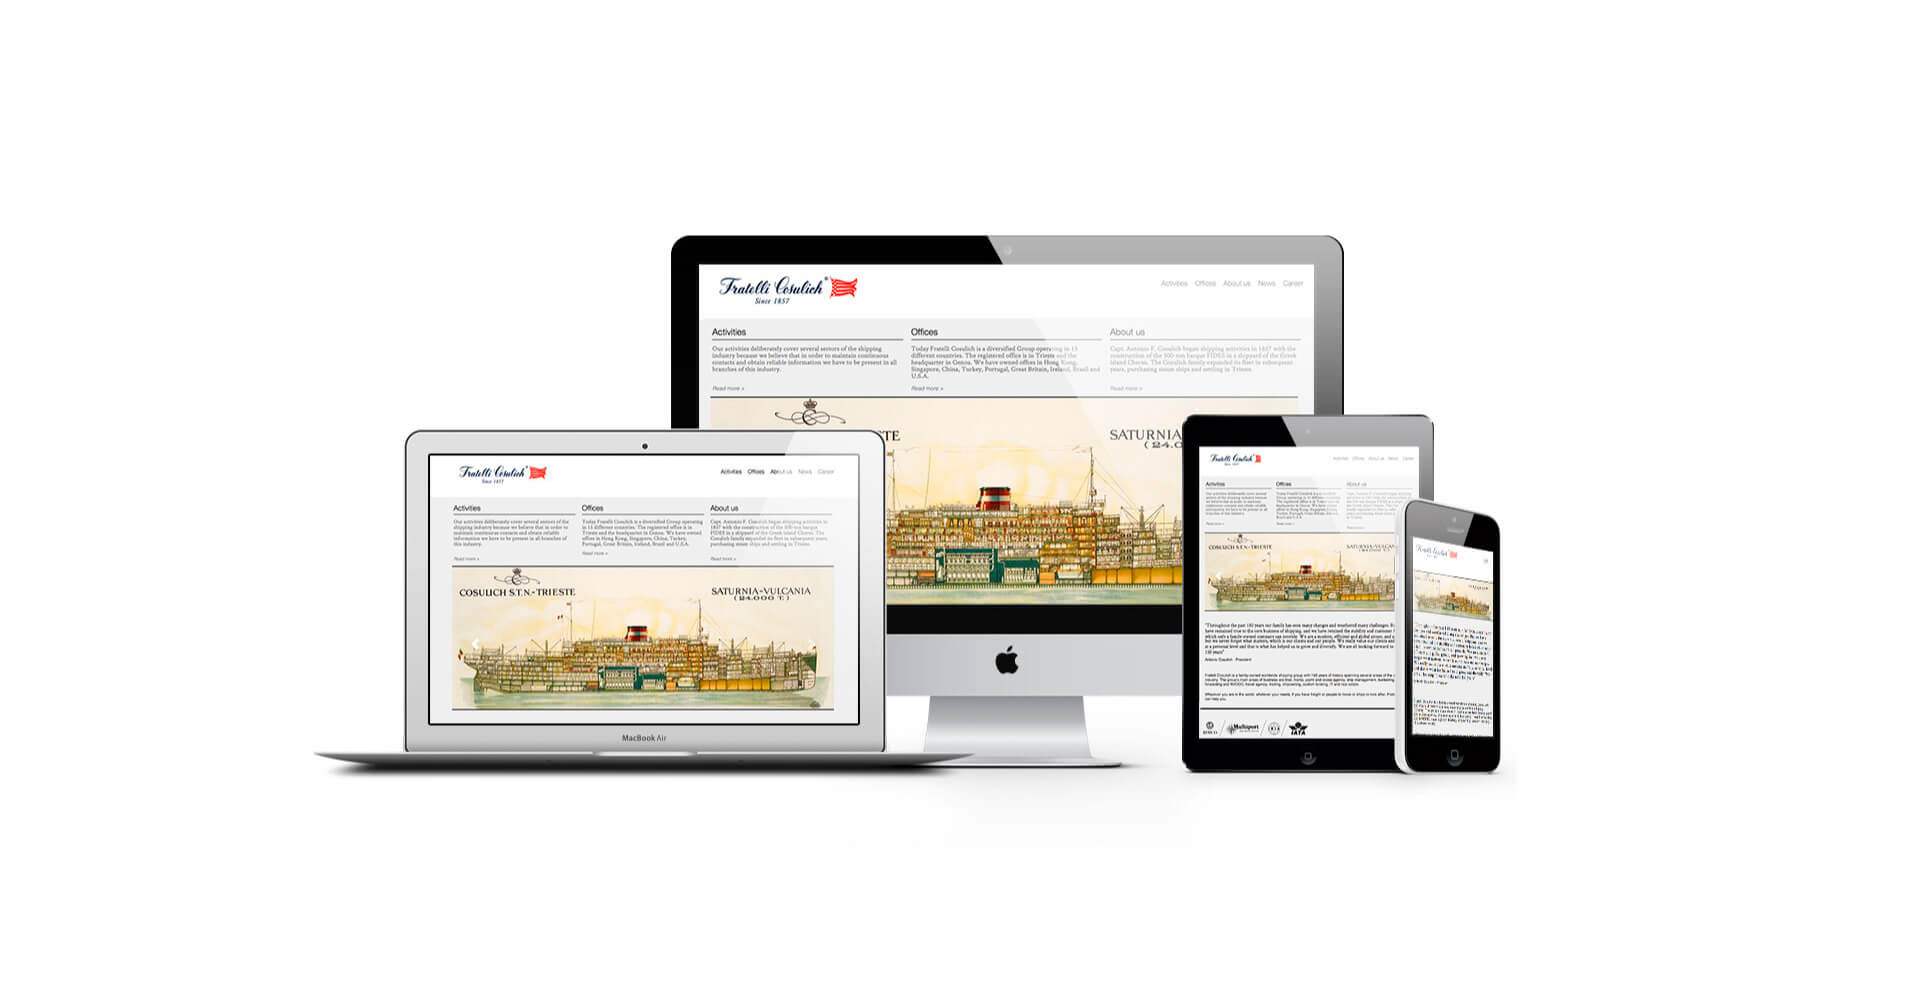 mintlab-webdesign-fratelli-cosulich-01